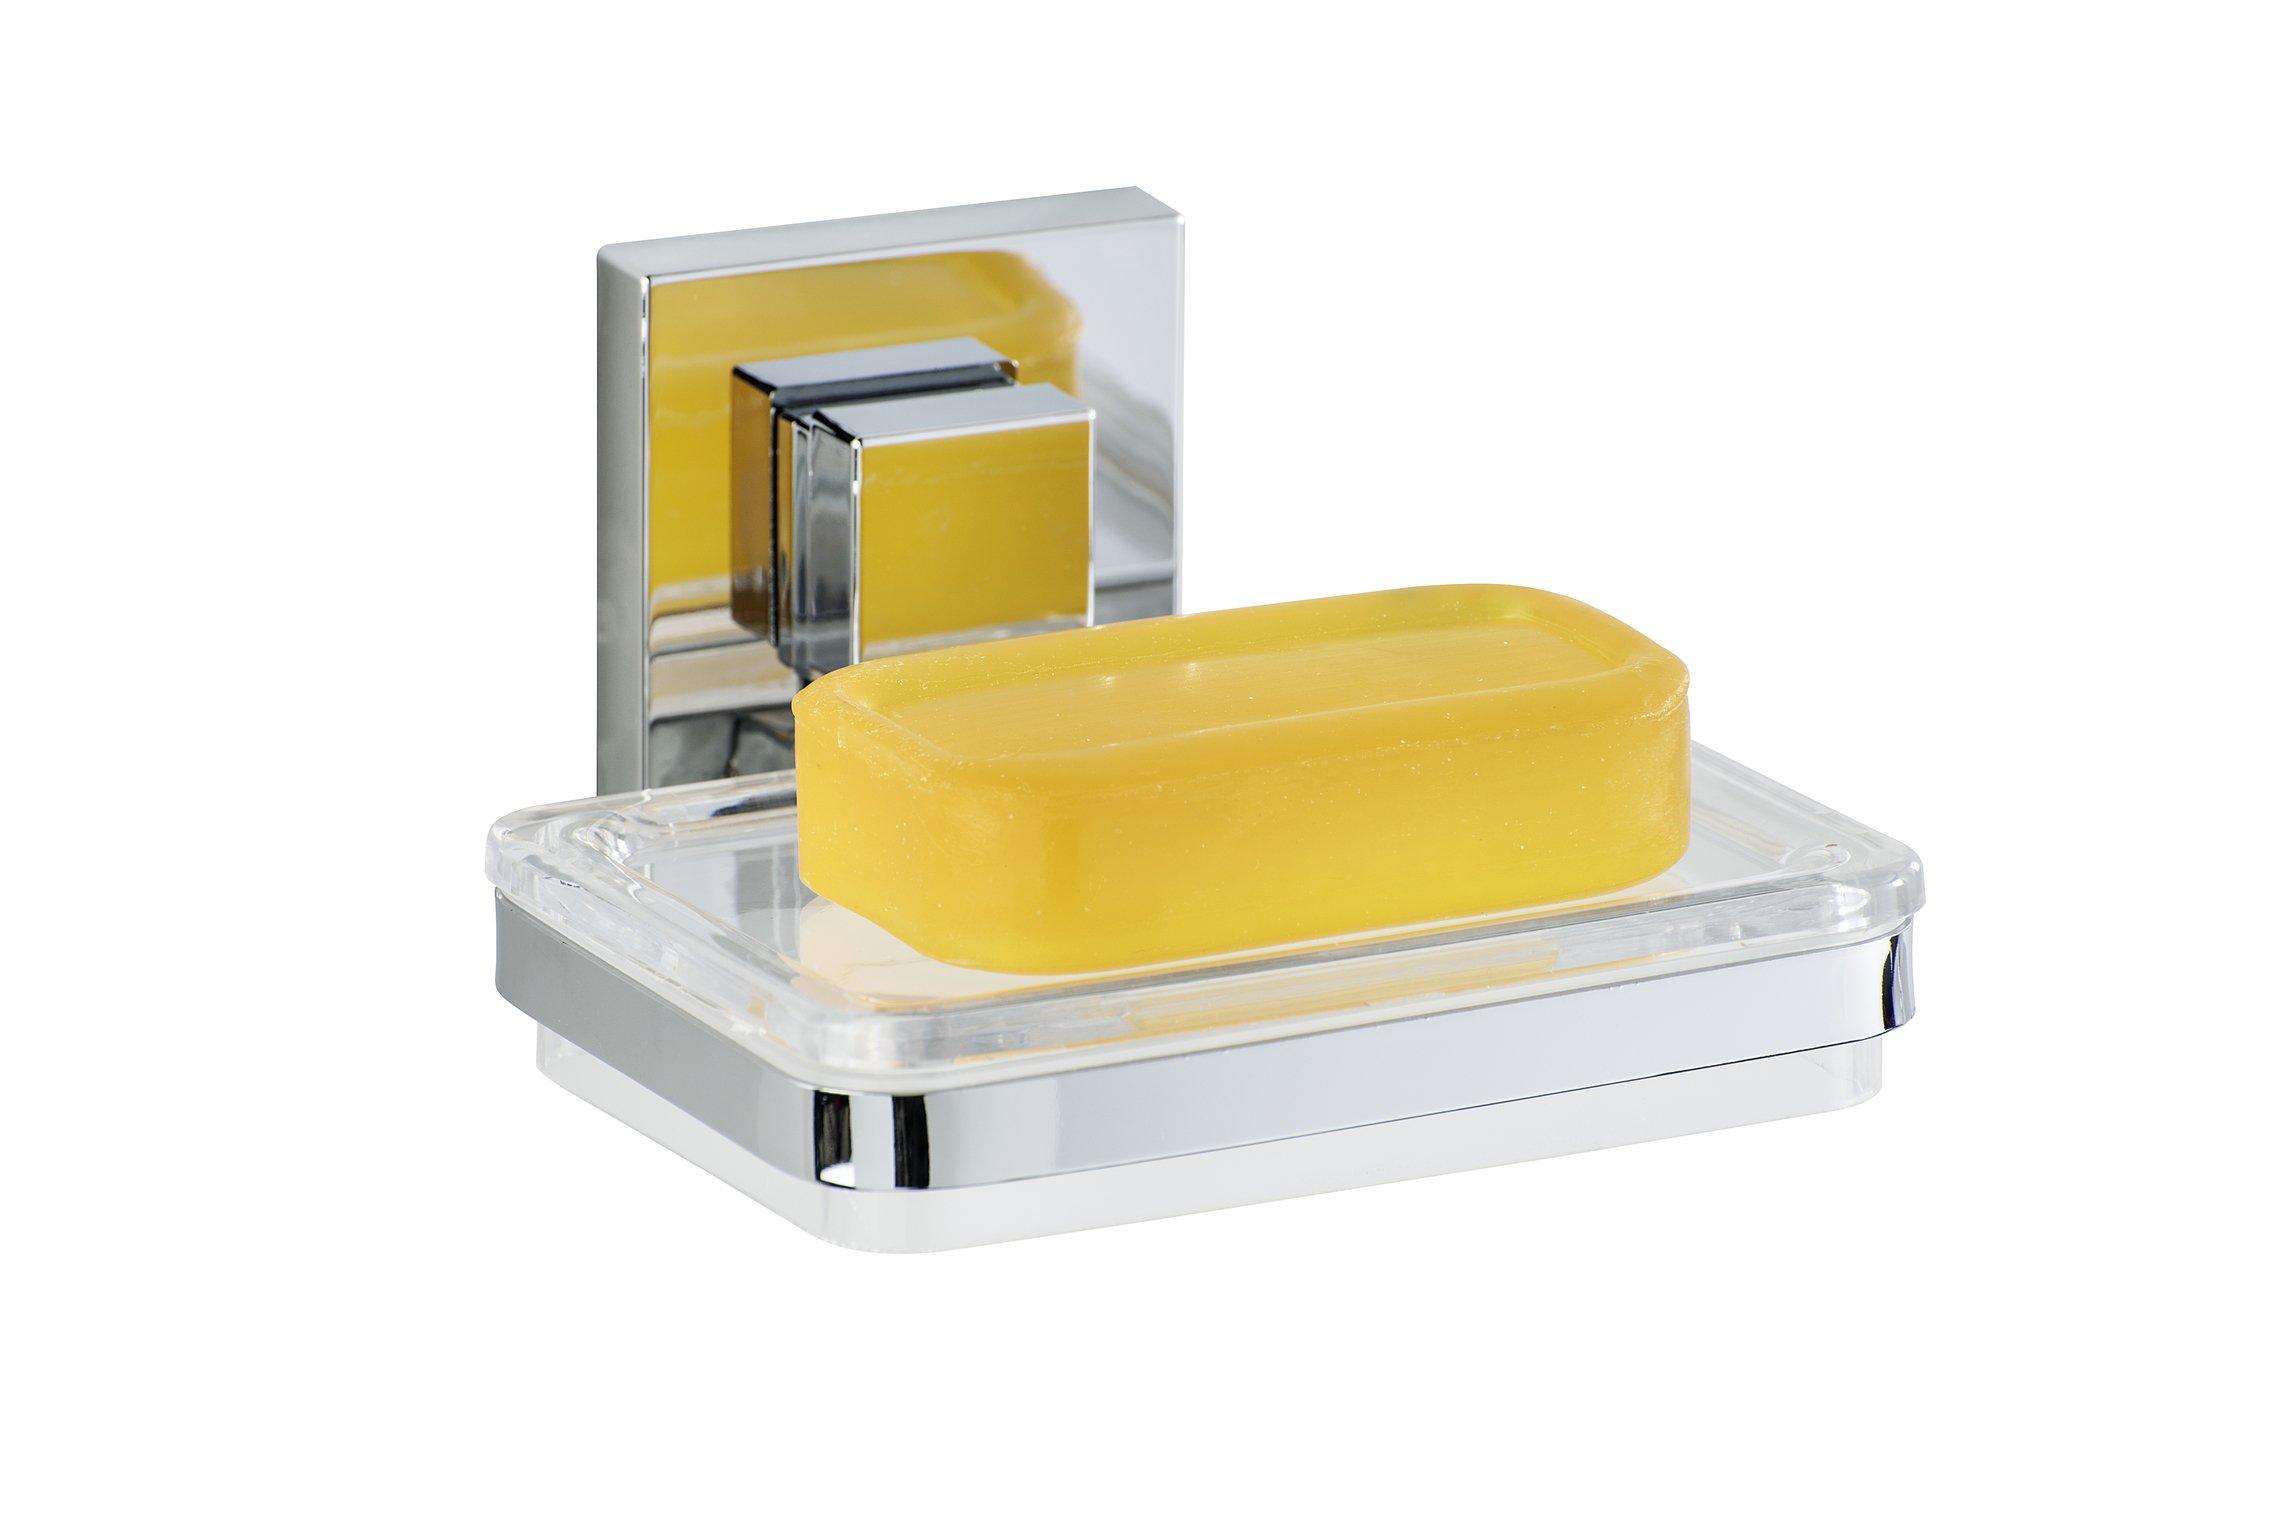 wenko 22681100 porte savon quadro vacuum loc abs acier inoxydable 12 x 6 5 x 12 cm inspid co. Black Bedroom Furniture Sets. Home Design Ideas